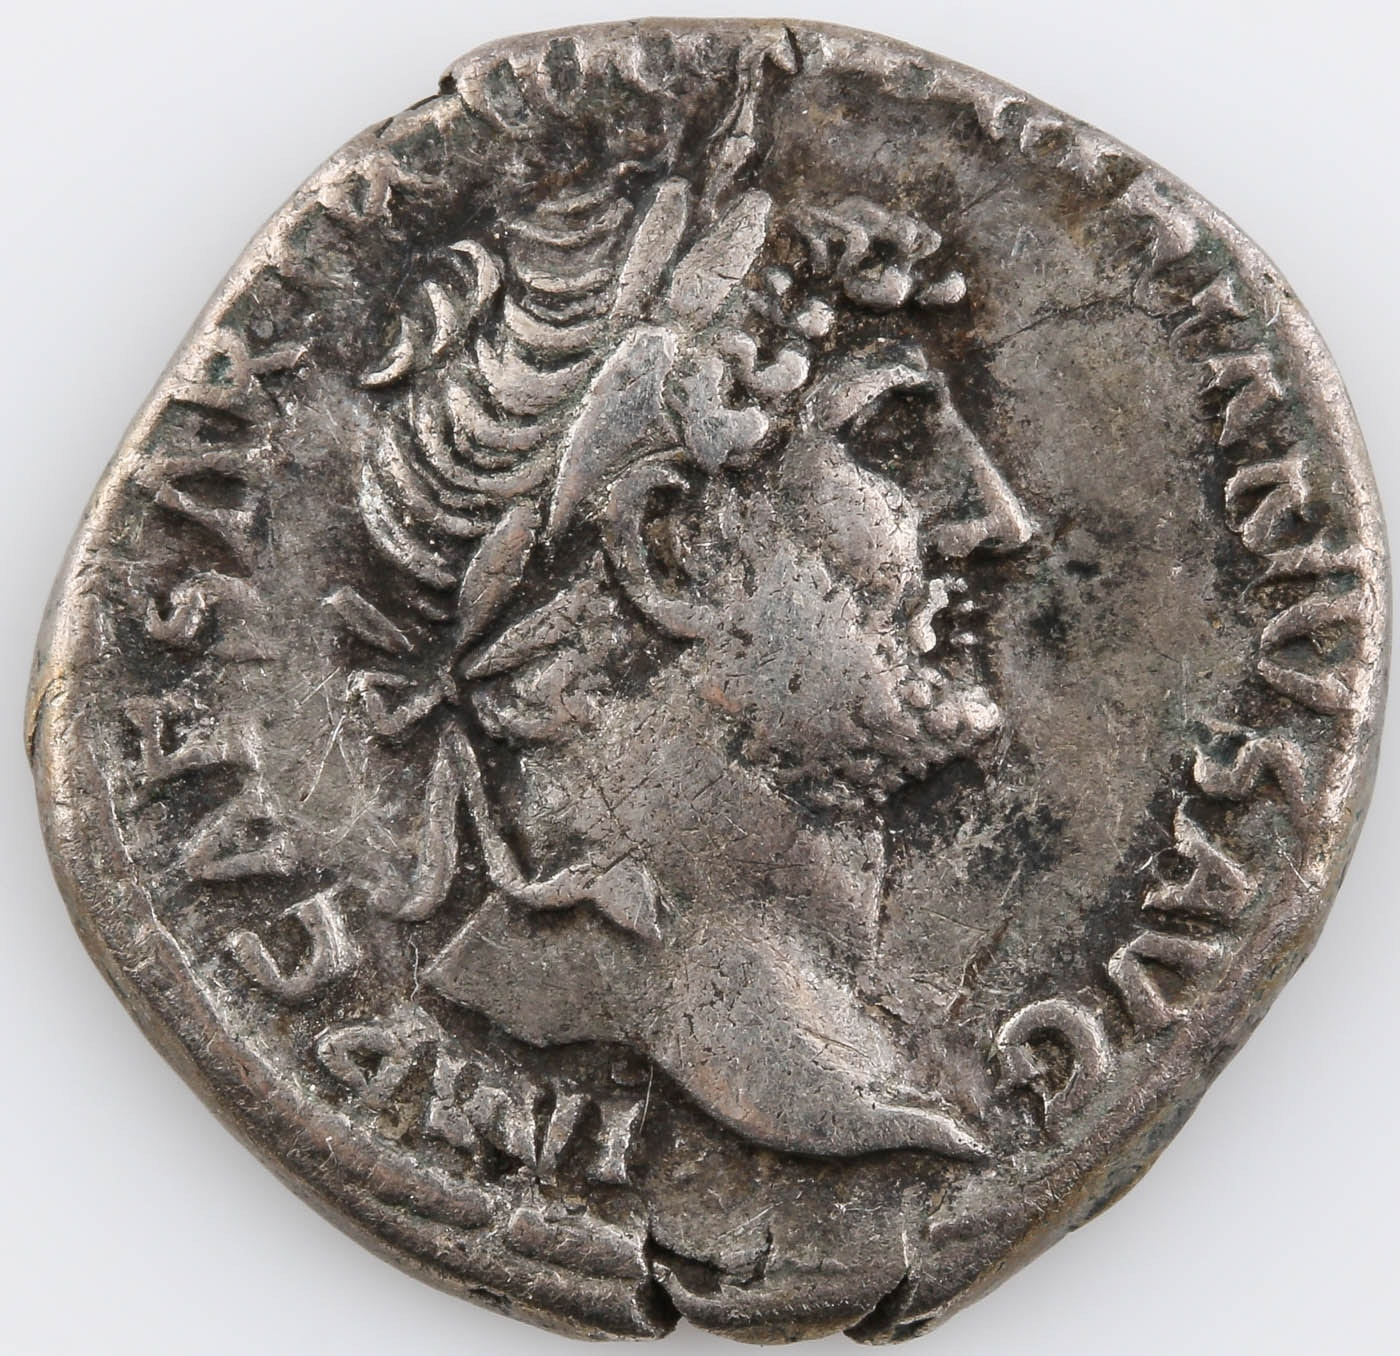 Ancient Roman Silver Denarius Coin: Hadrian 117-138 A.D